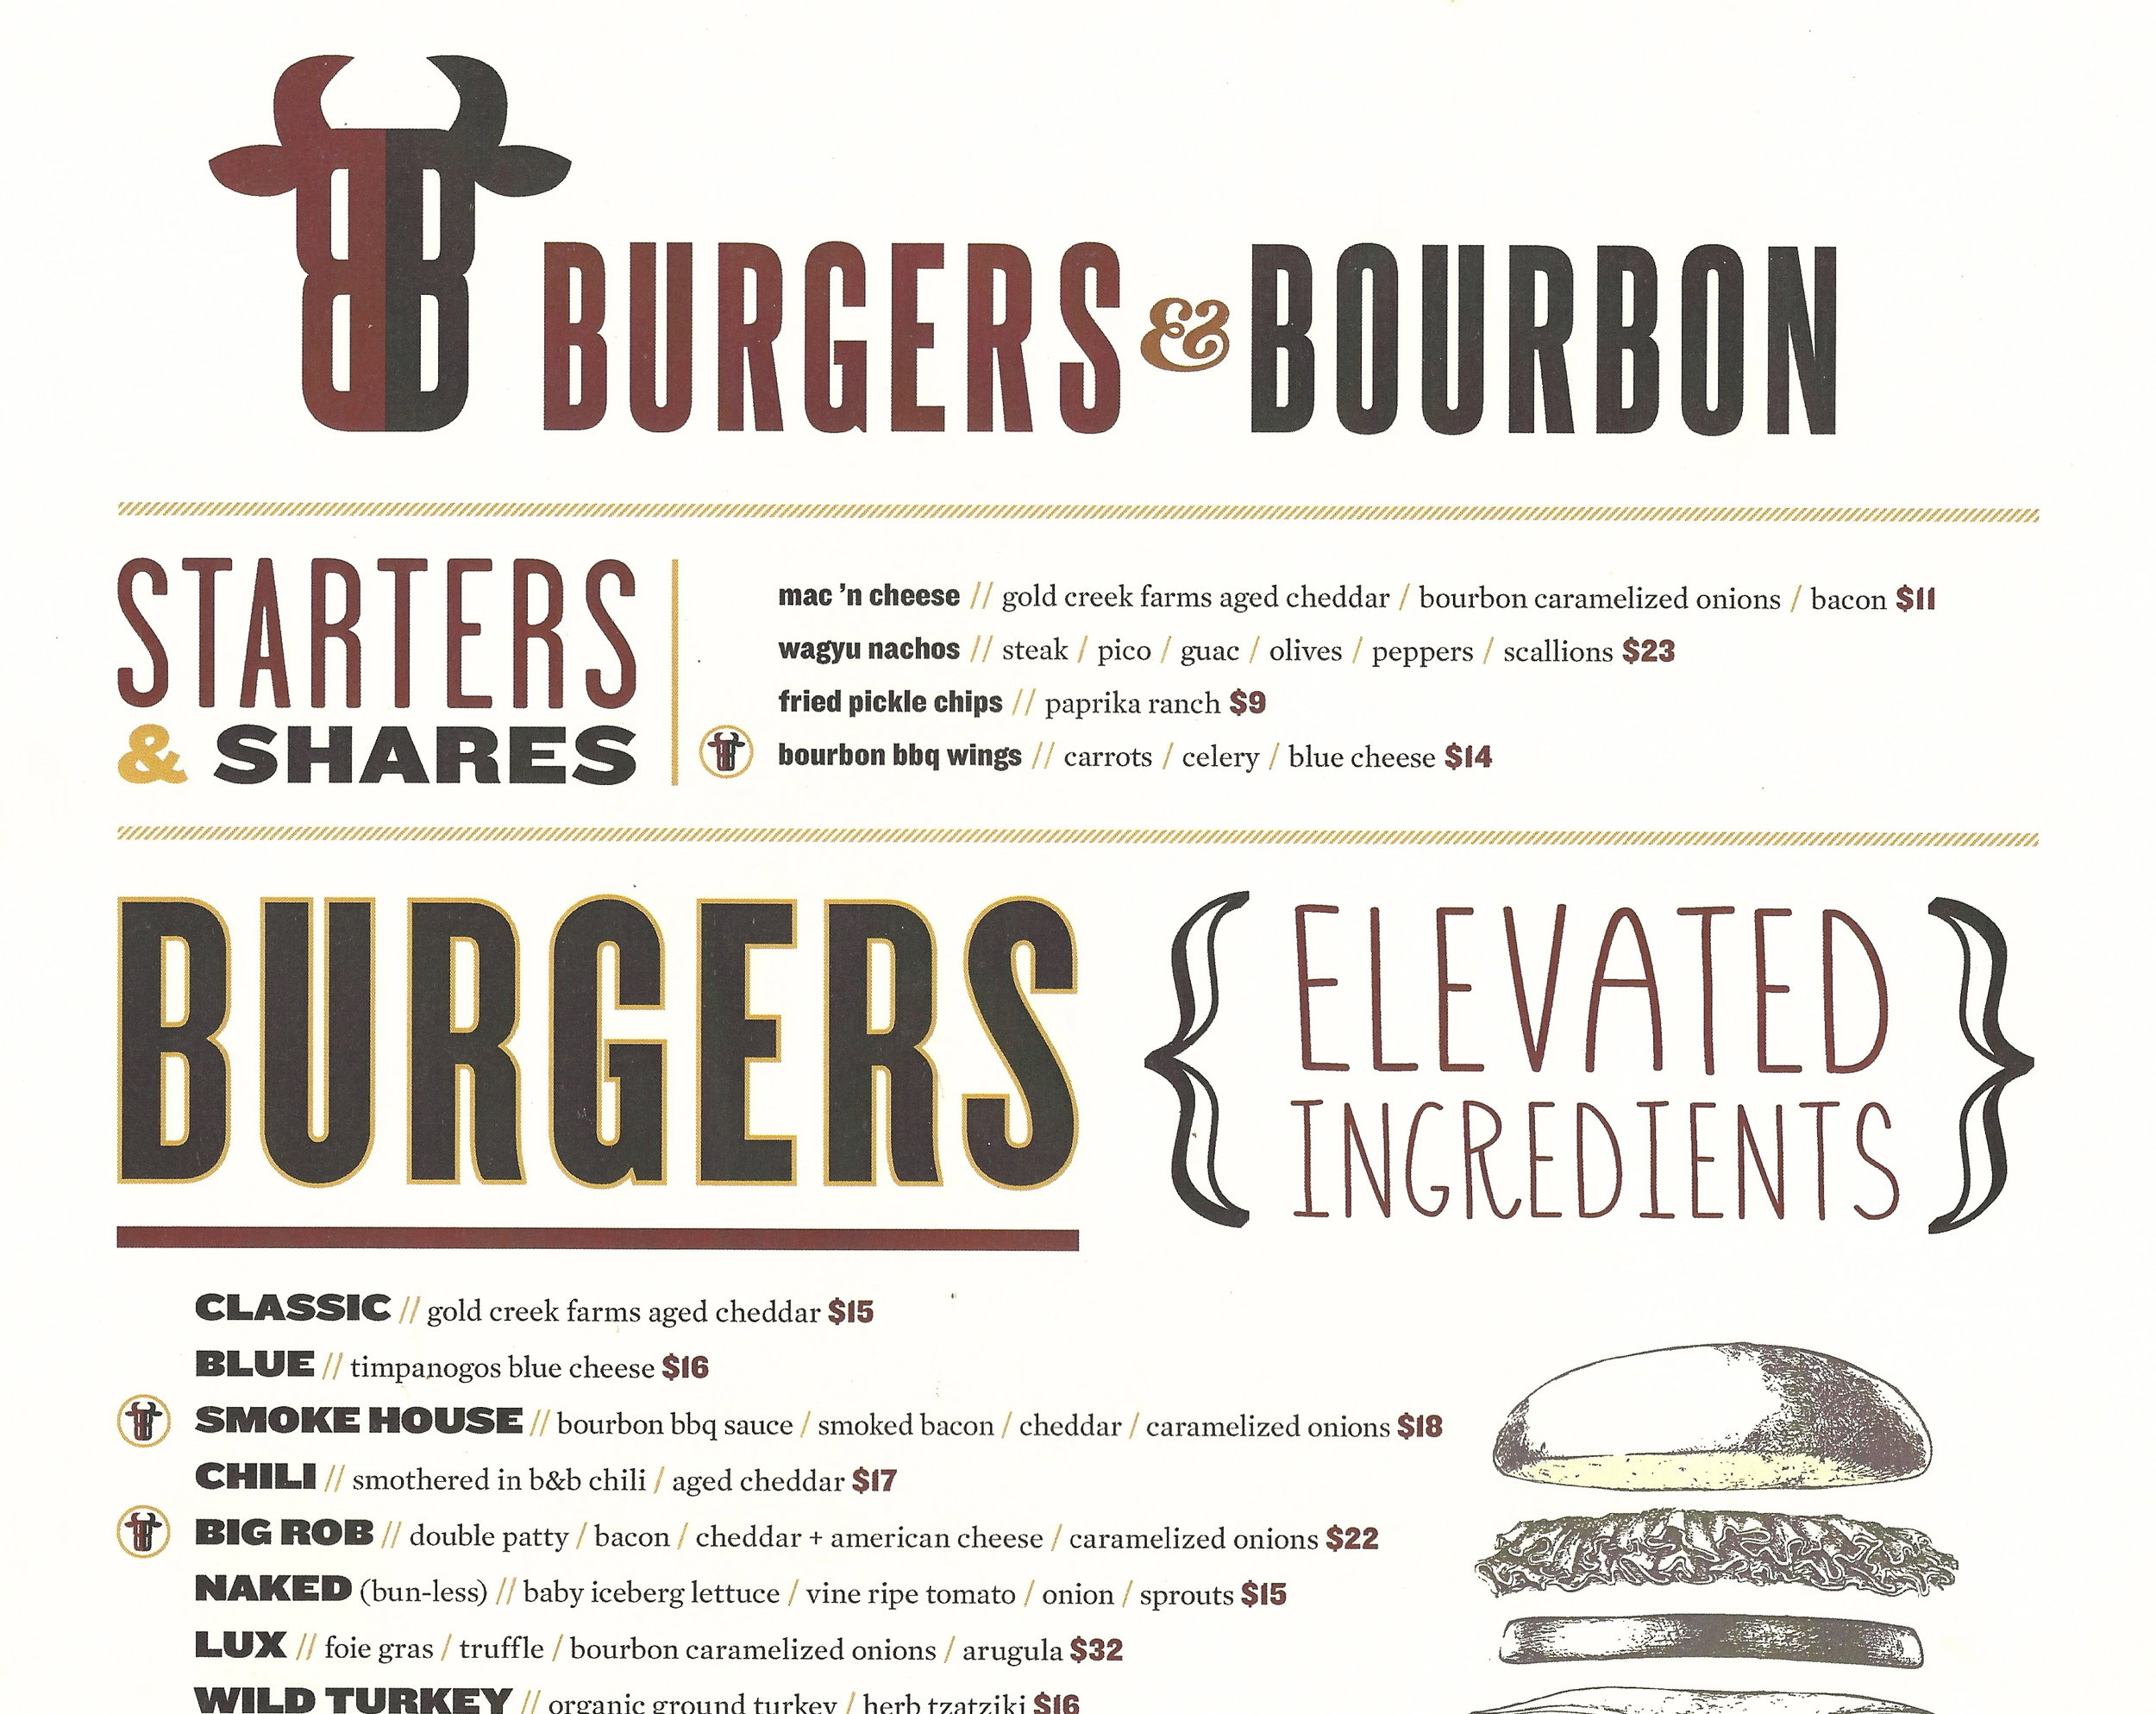 Burgers Bourbon 2